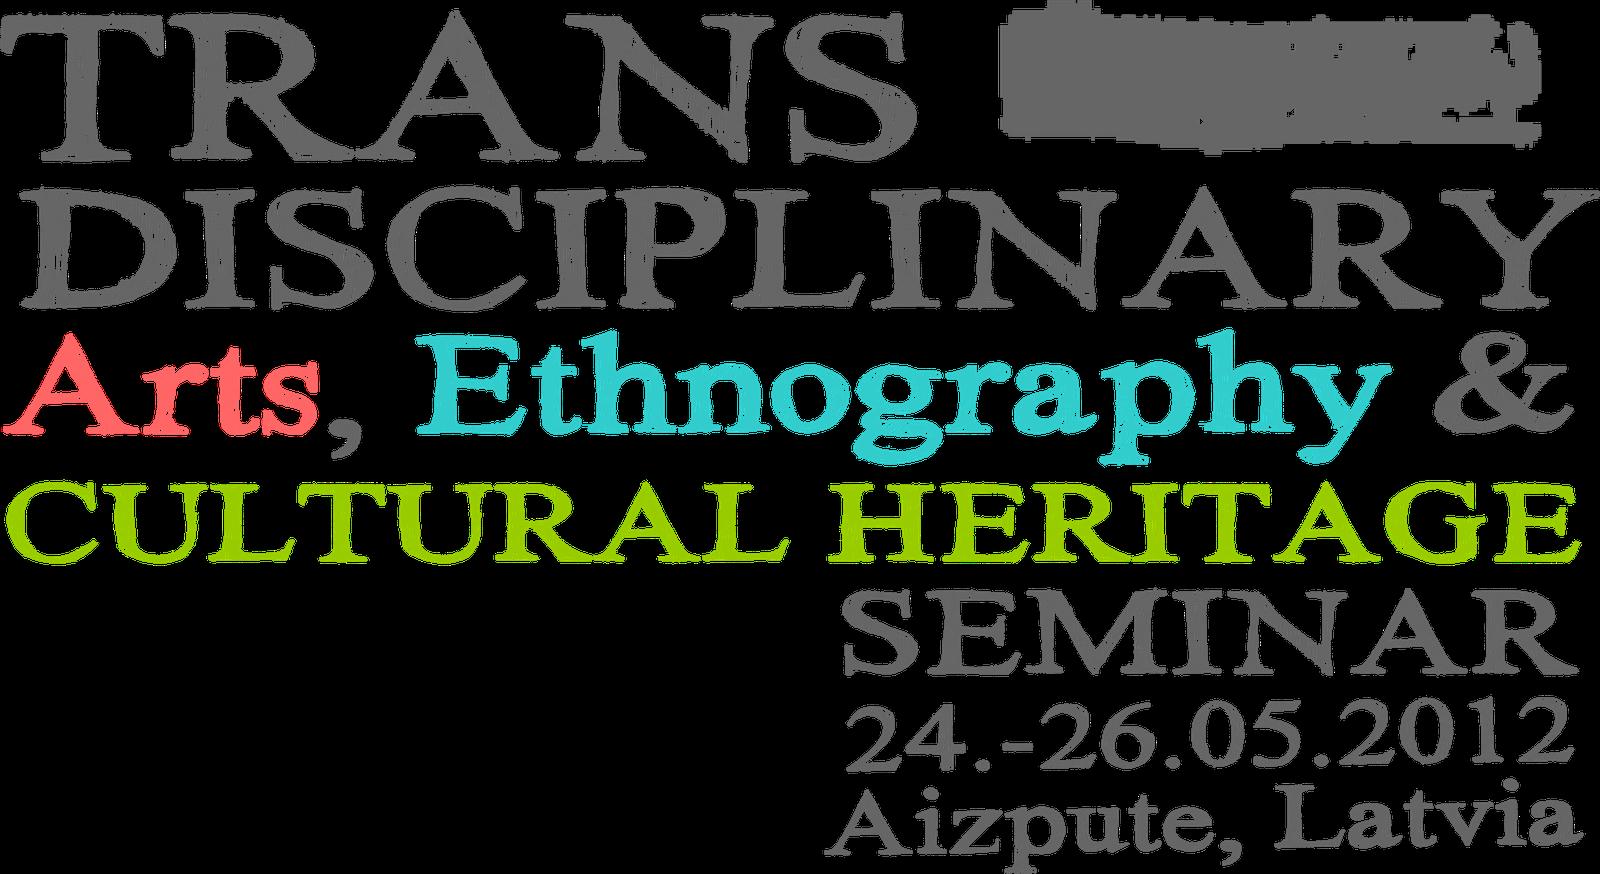 TRANS-DISCIPLINARY ARTS, ETHNOGRAPHY & CULTURAL HERITAGE SEMINAR